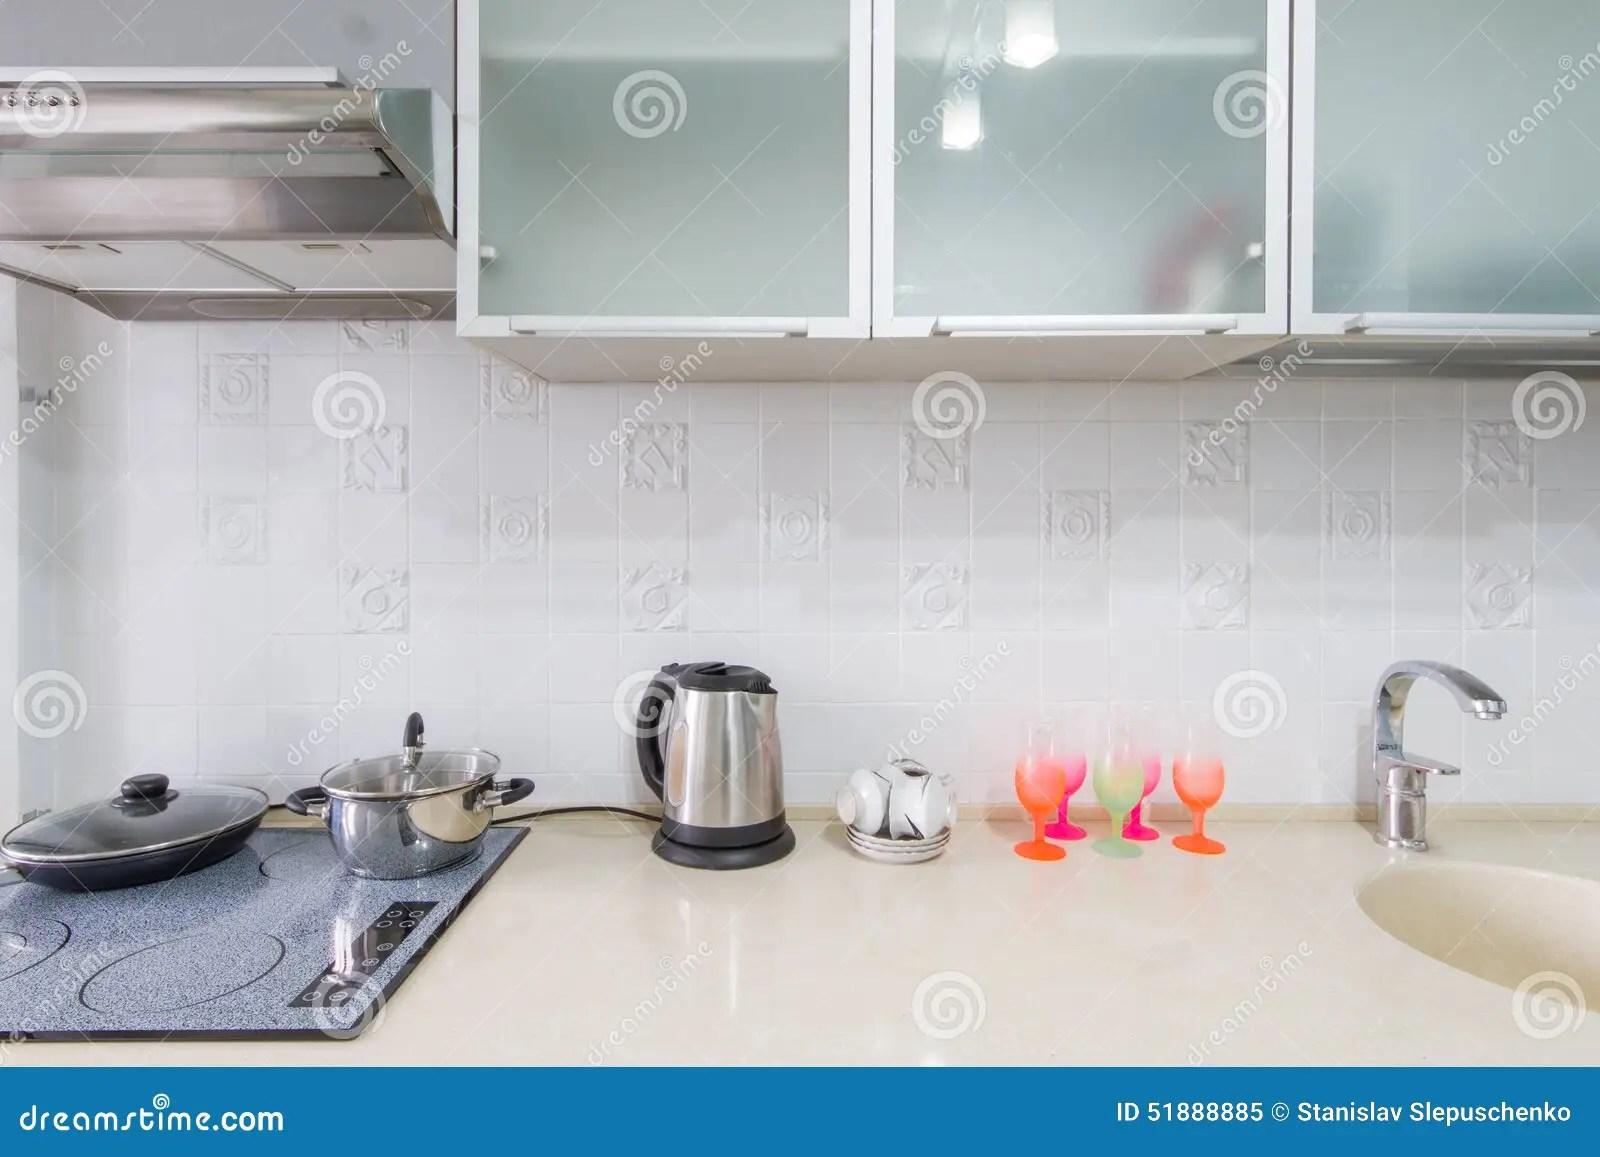 kitchen sink grates color ideas for 厨房内部特写镜头库存图片 图片包括有大理石 夹具 豪华 扁平烤盘 在框架的厨房内部特写镜头包含桌 水槽和煤气炉